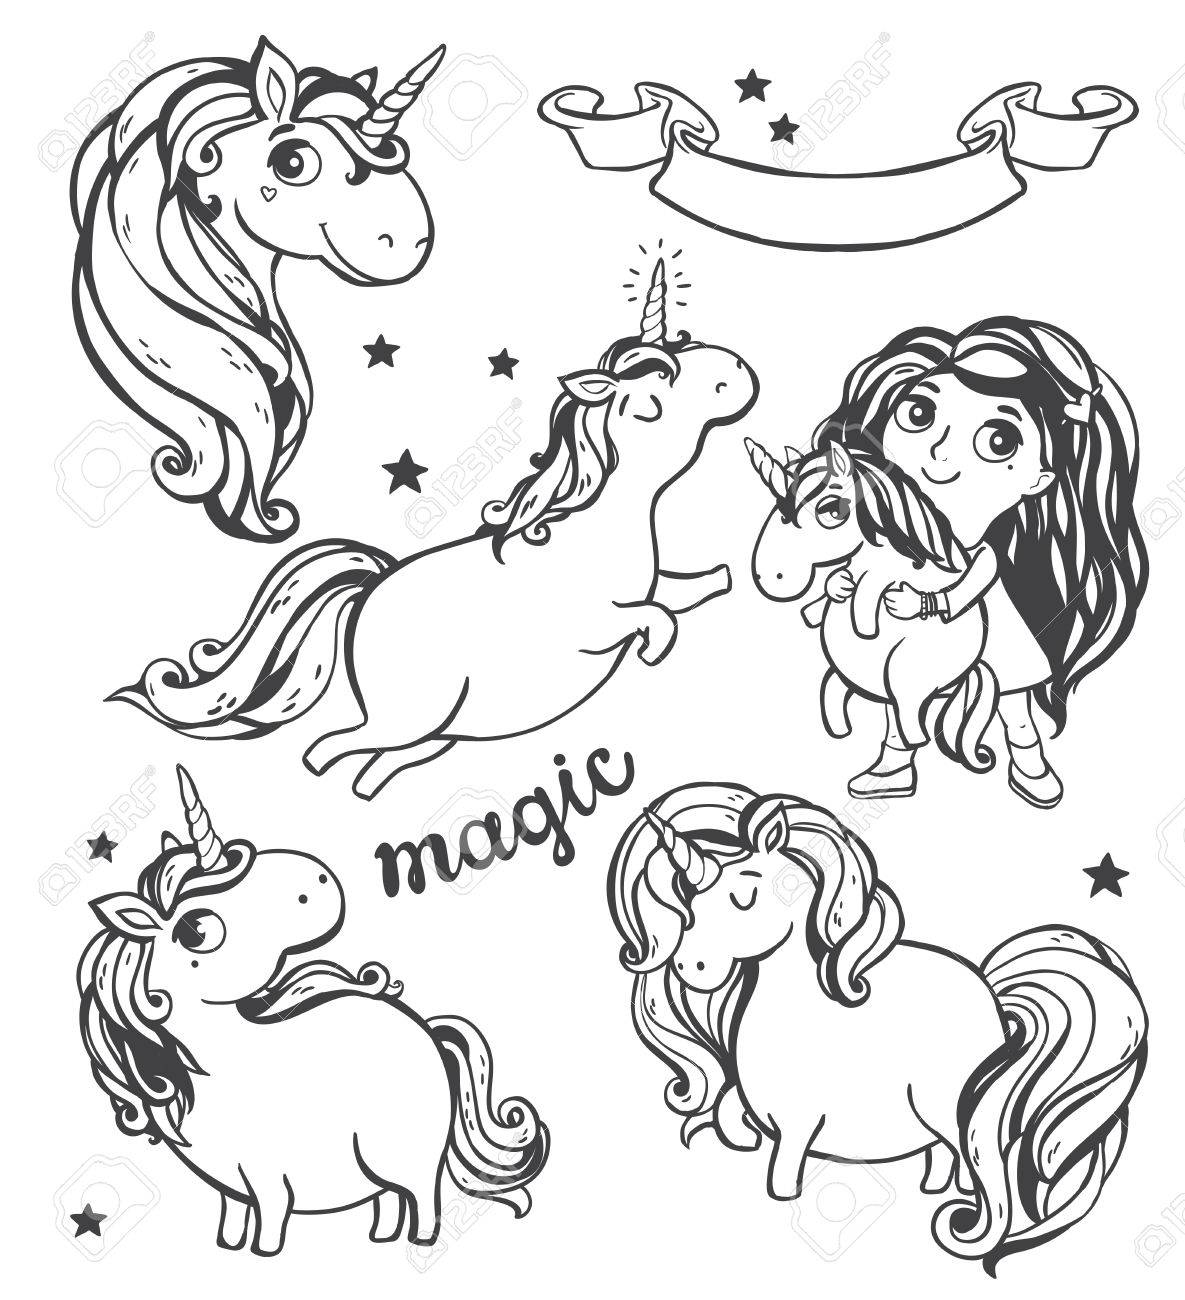 Gold glitter unicorn isolated on white background. Vector illustration. - 49963725